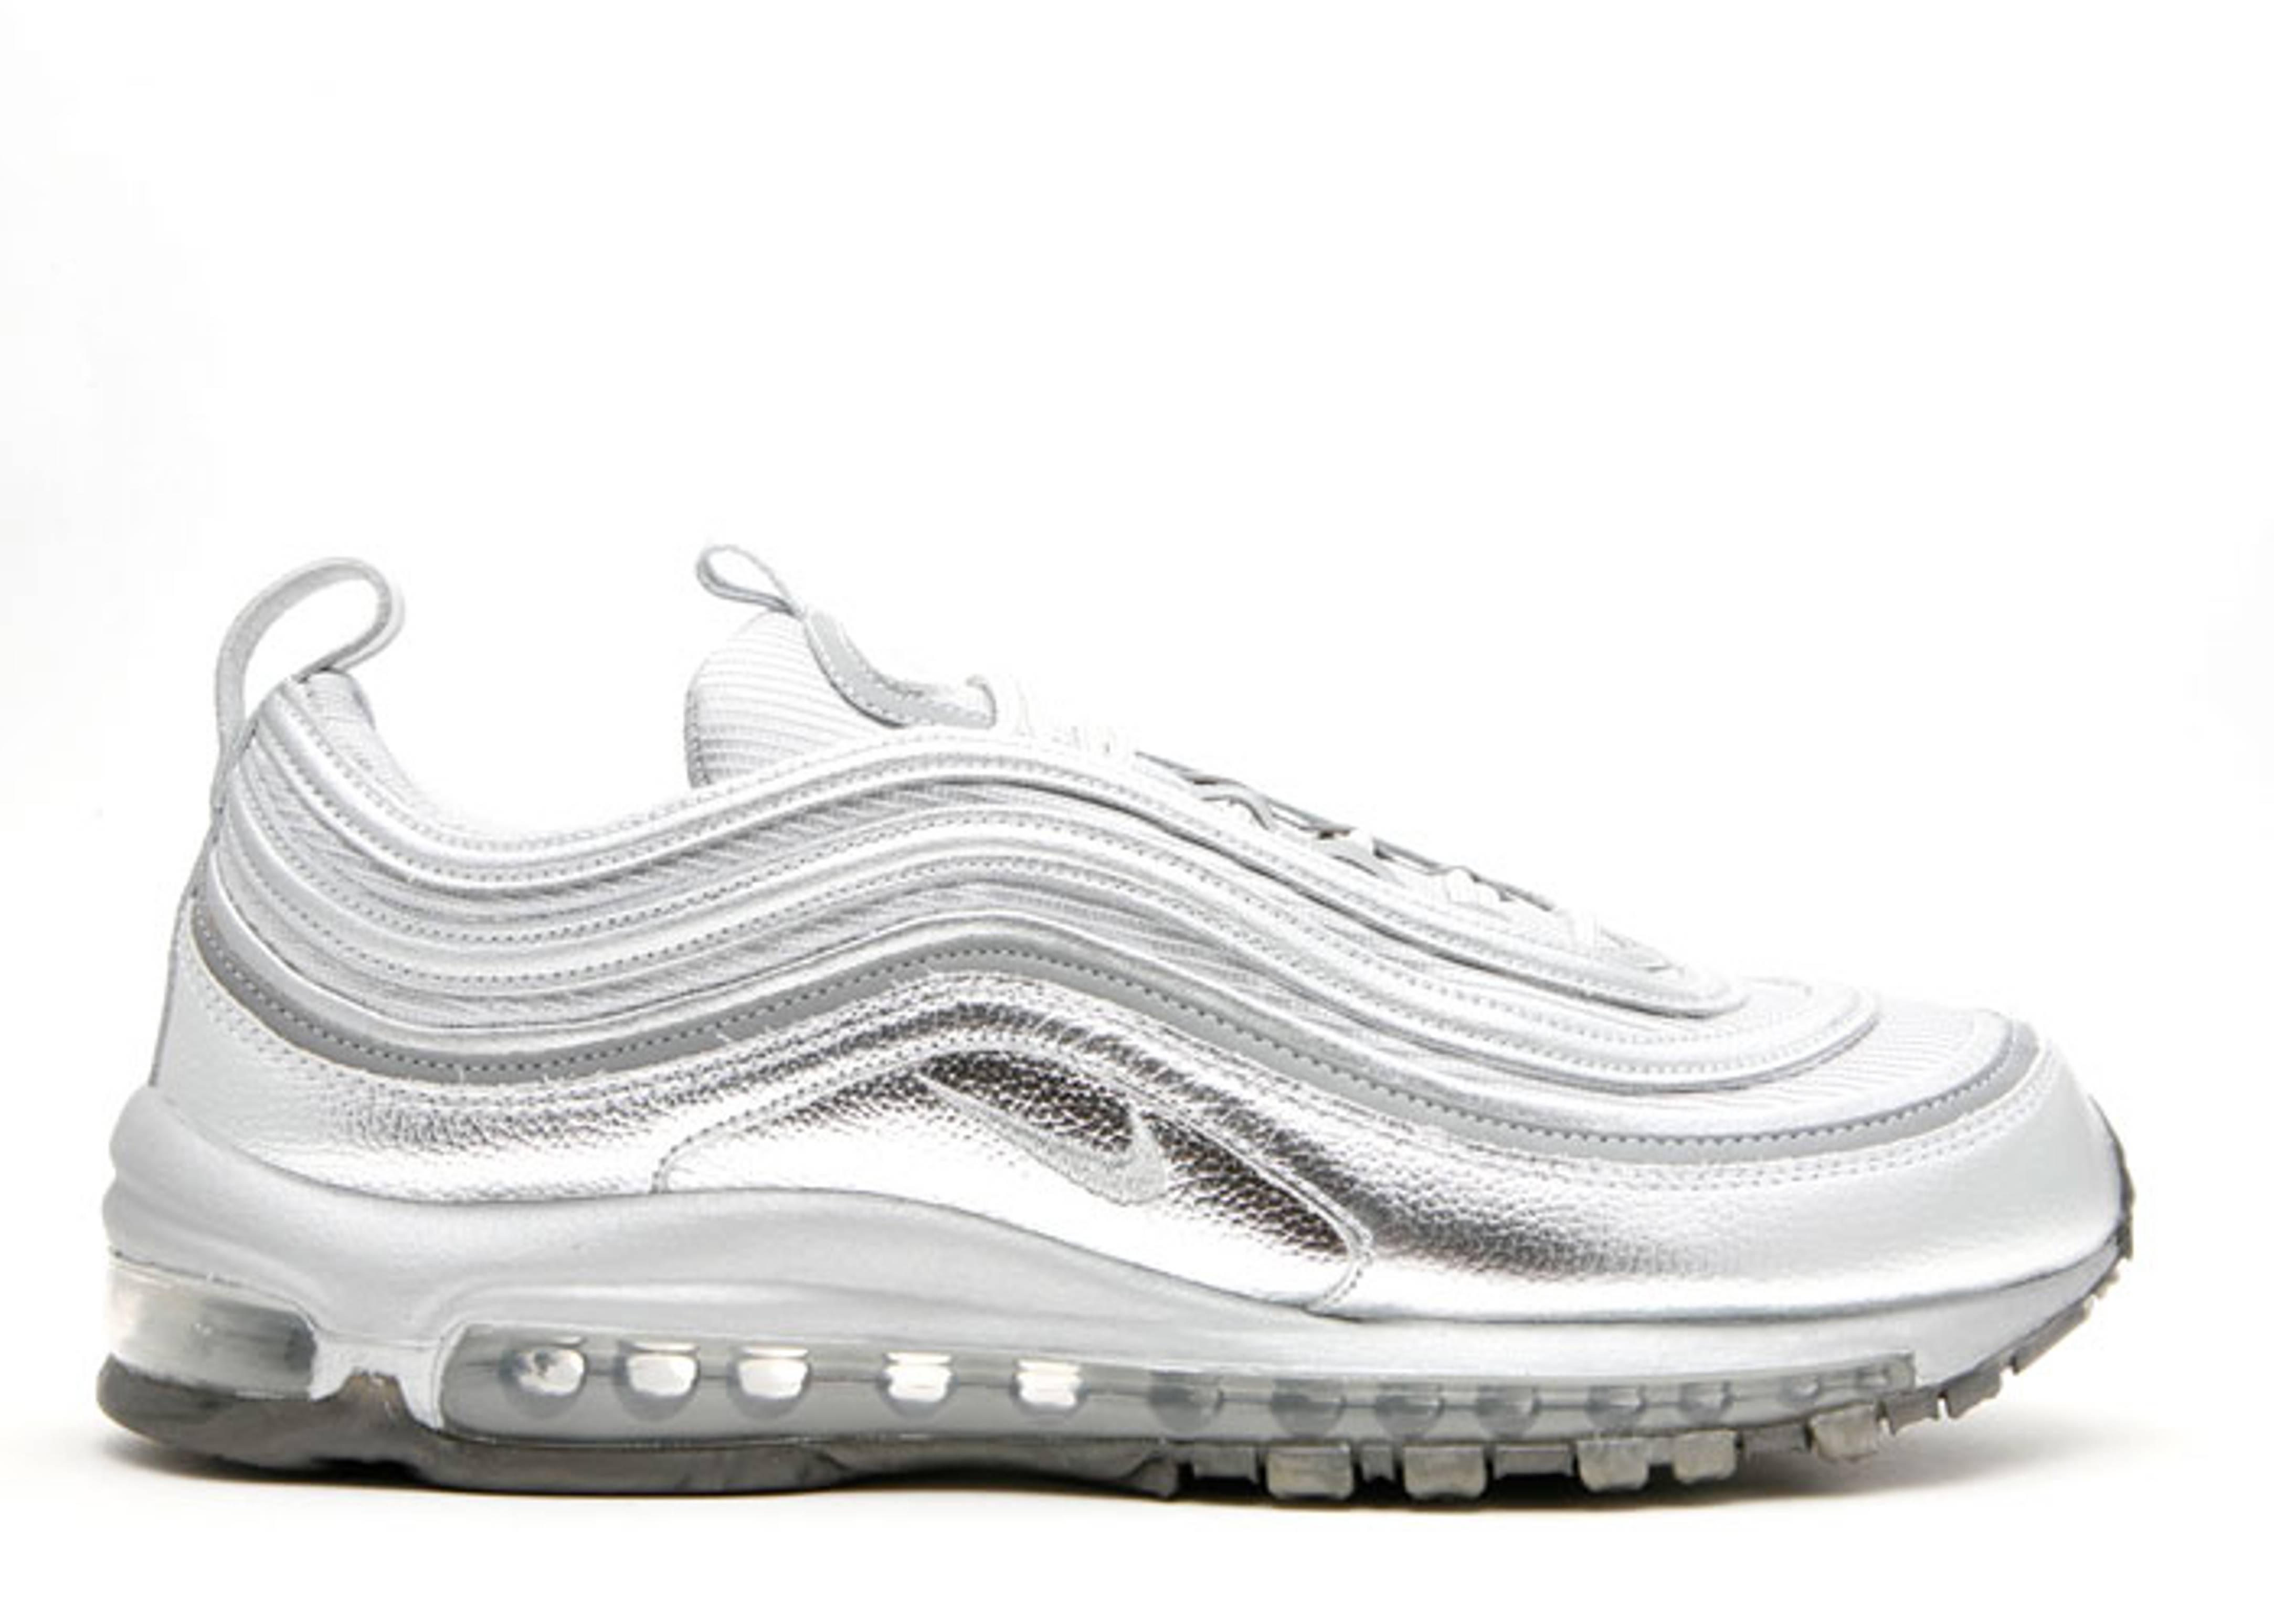 reputable site 5f58c a7c04 Air Max 97 Supreme - Nike - 316782 002 - metallic silver metallic silver-black    Flight Club